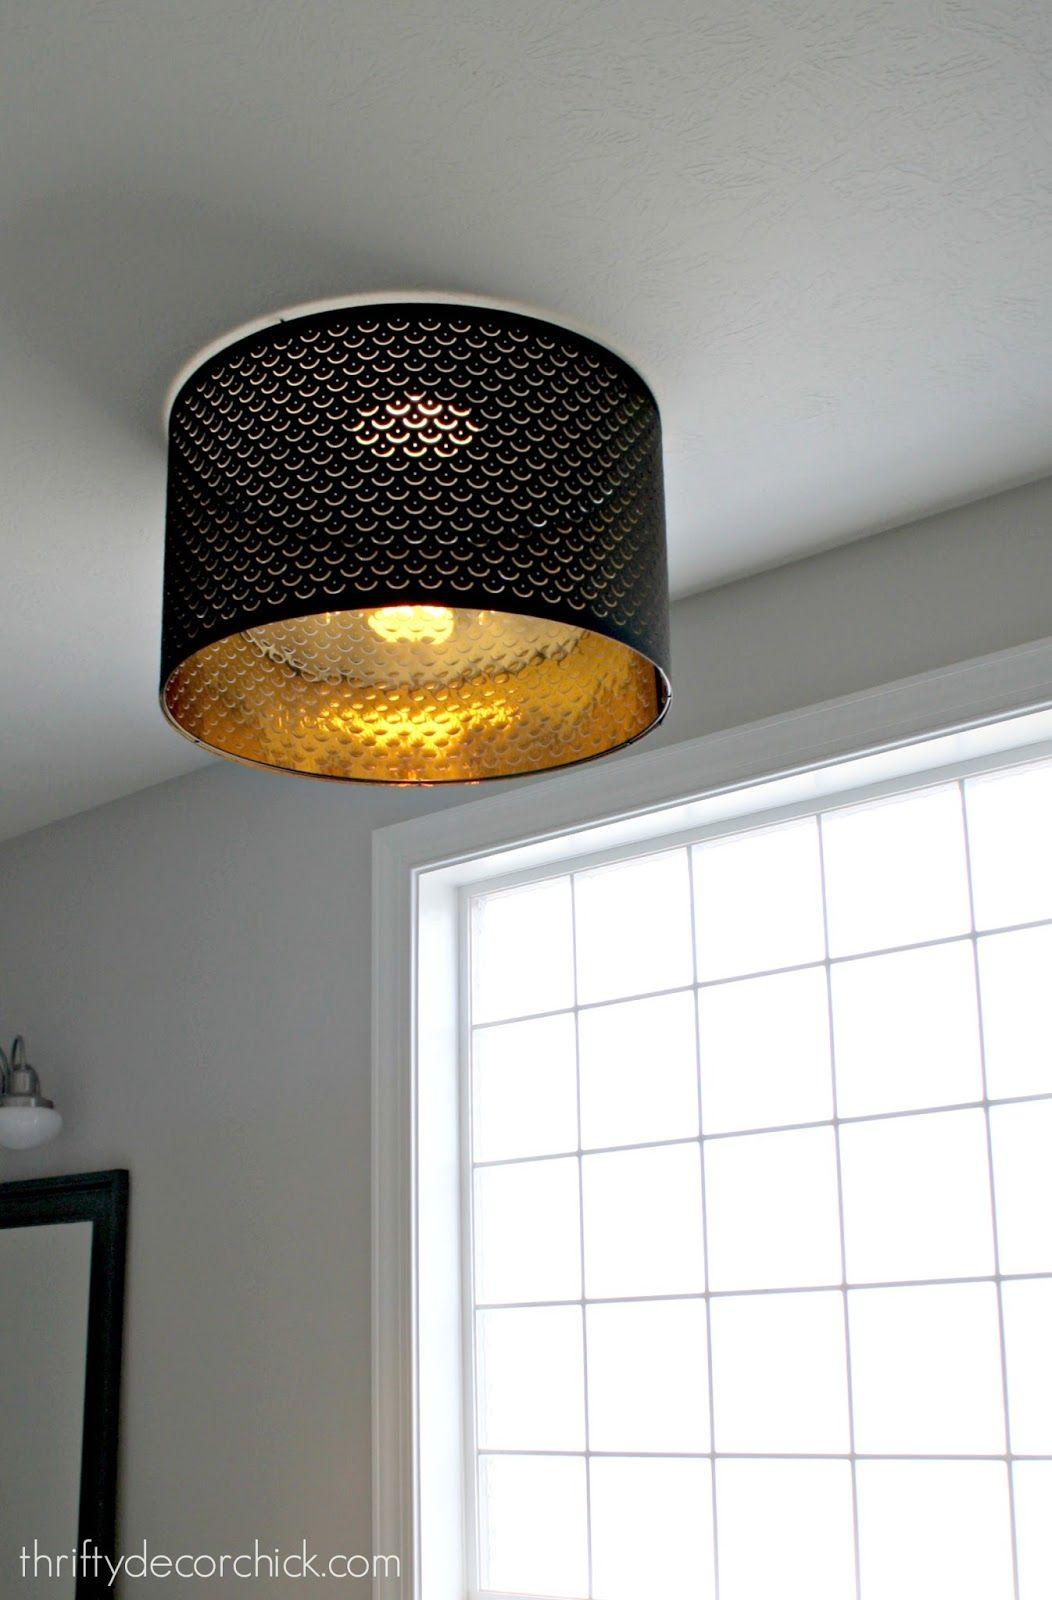 Using A Lamp Shade As A Light Fixture Ikea Lamp Shade Diy Light Fixtures Ceiling Lamp Shades